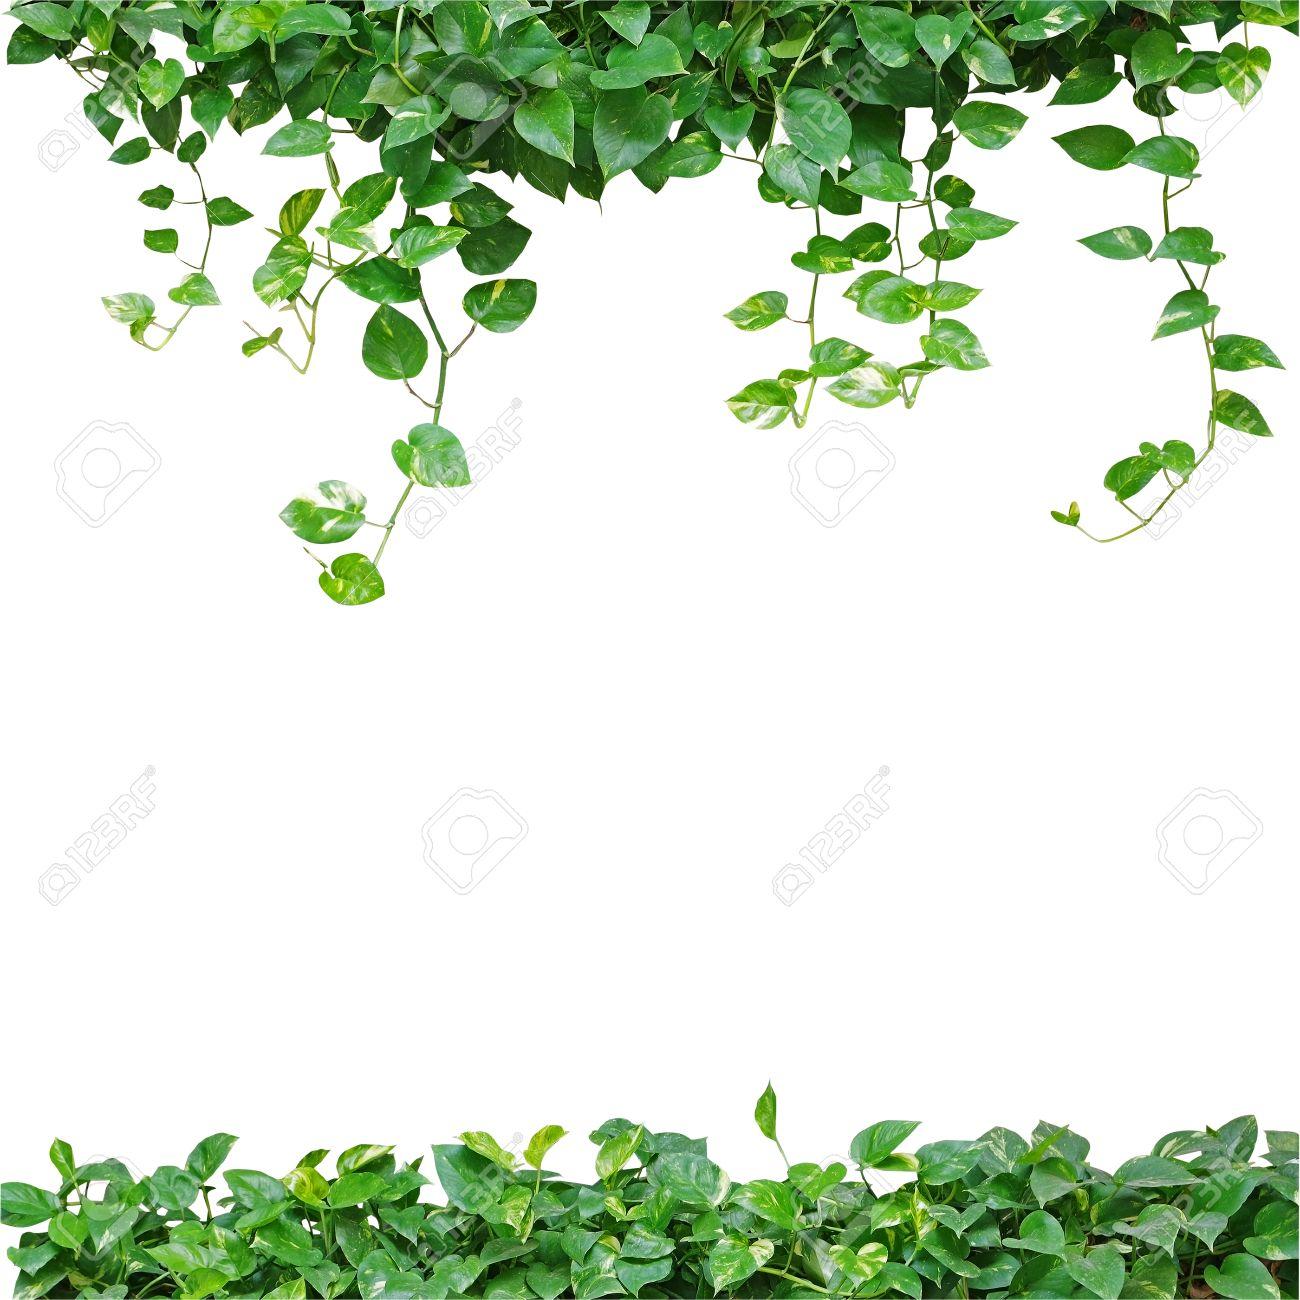 Herzförmige Blätter Rebe, Teufels Efeu, Golden Pothos, Isoliert Auf ...